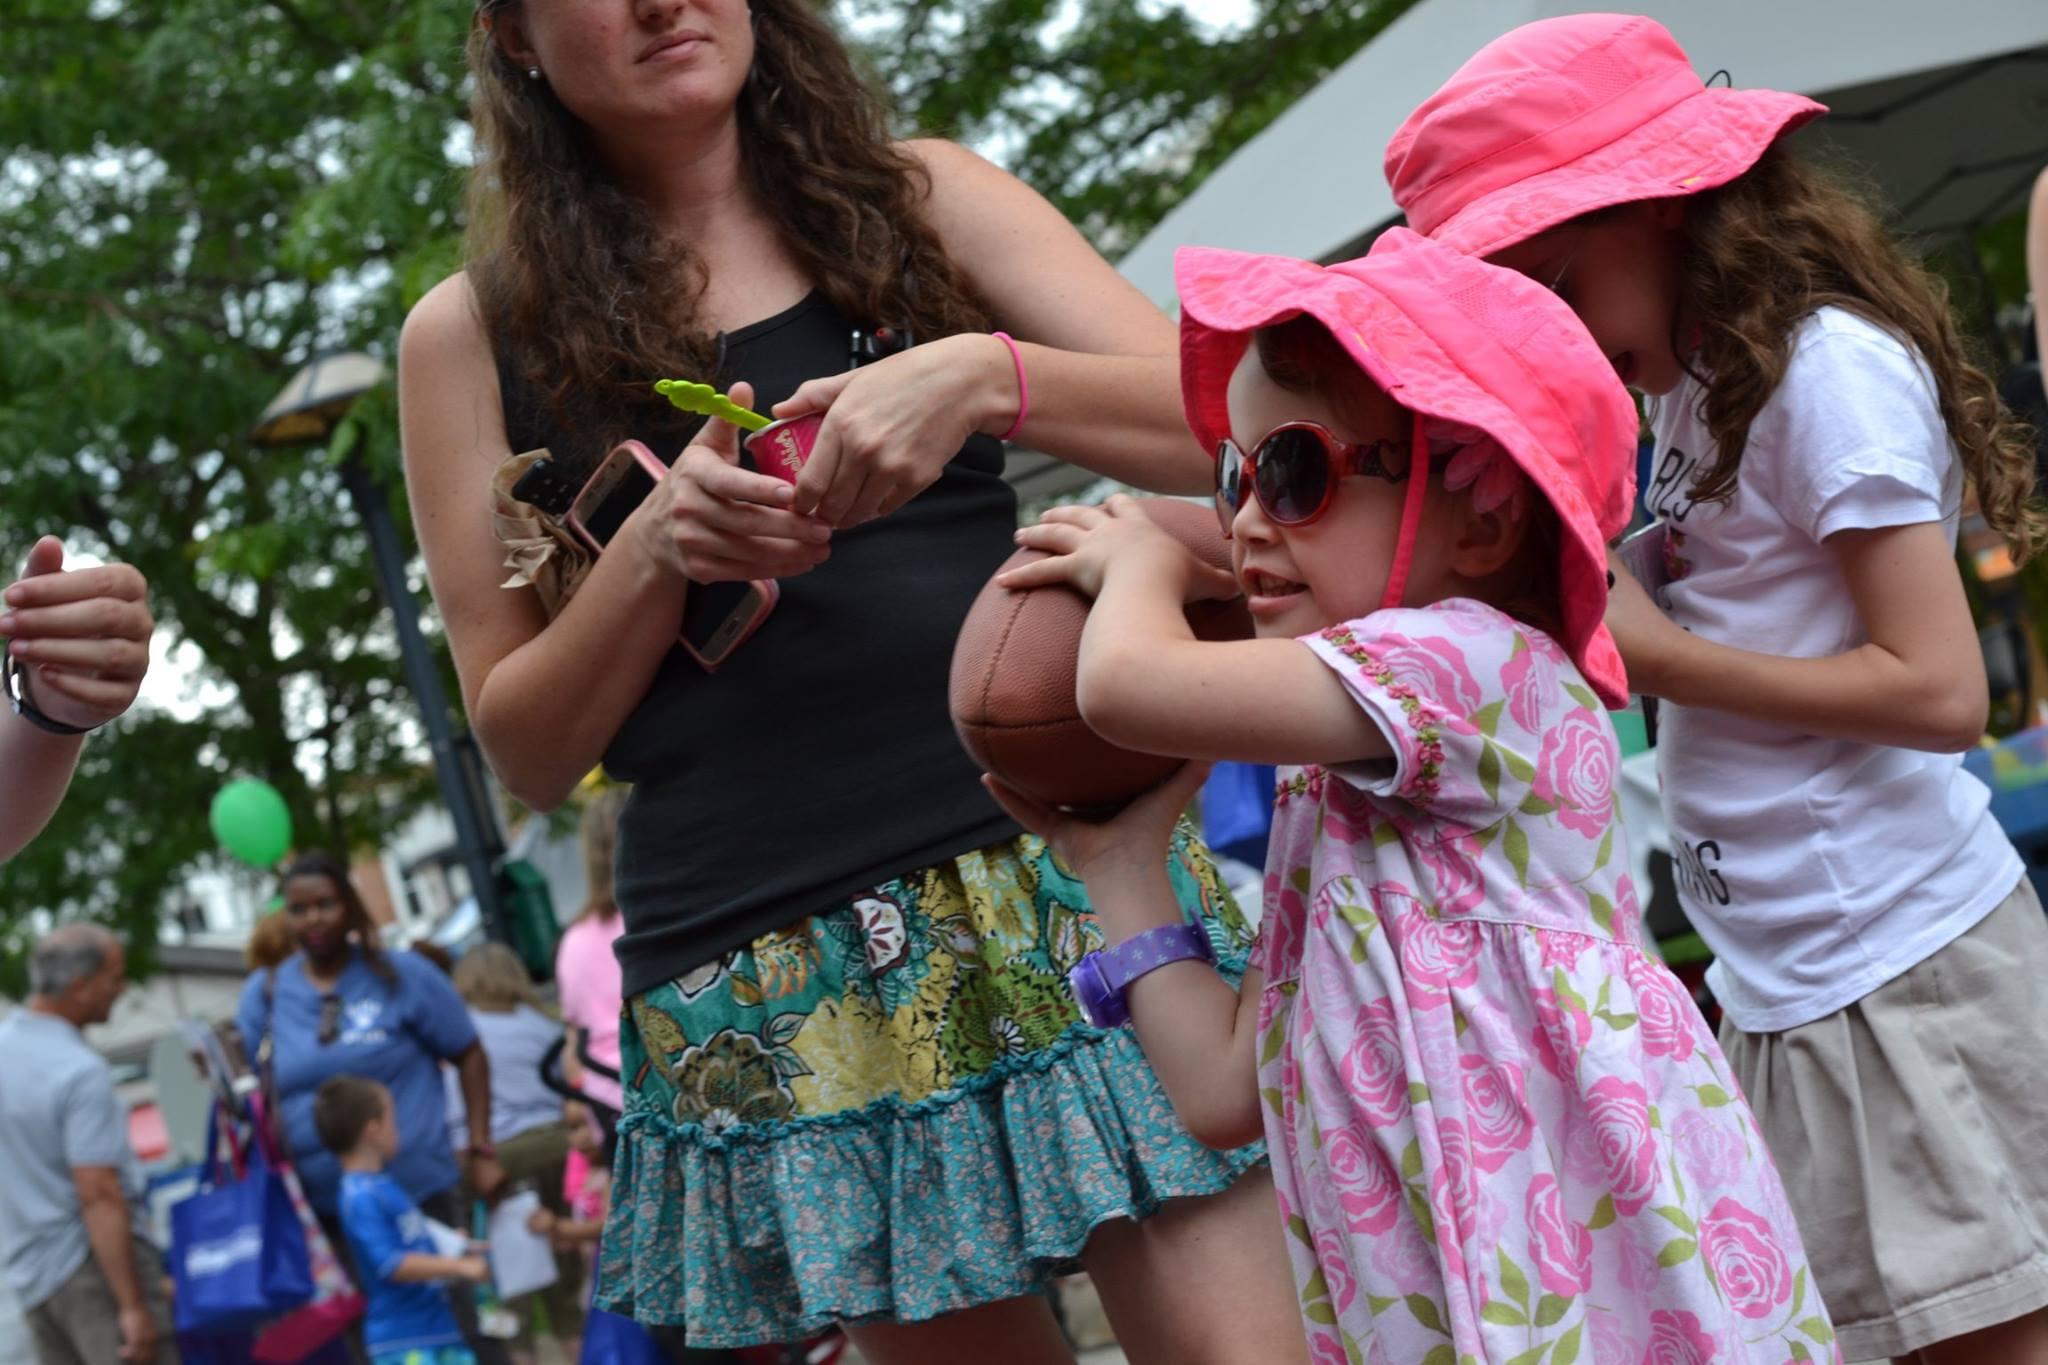 Crocker Kids takes place in Westlake